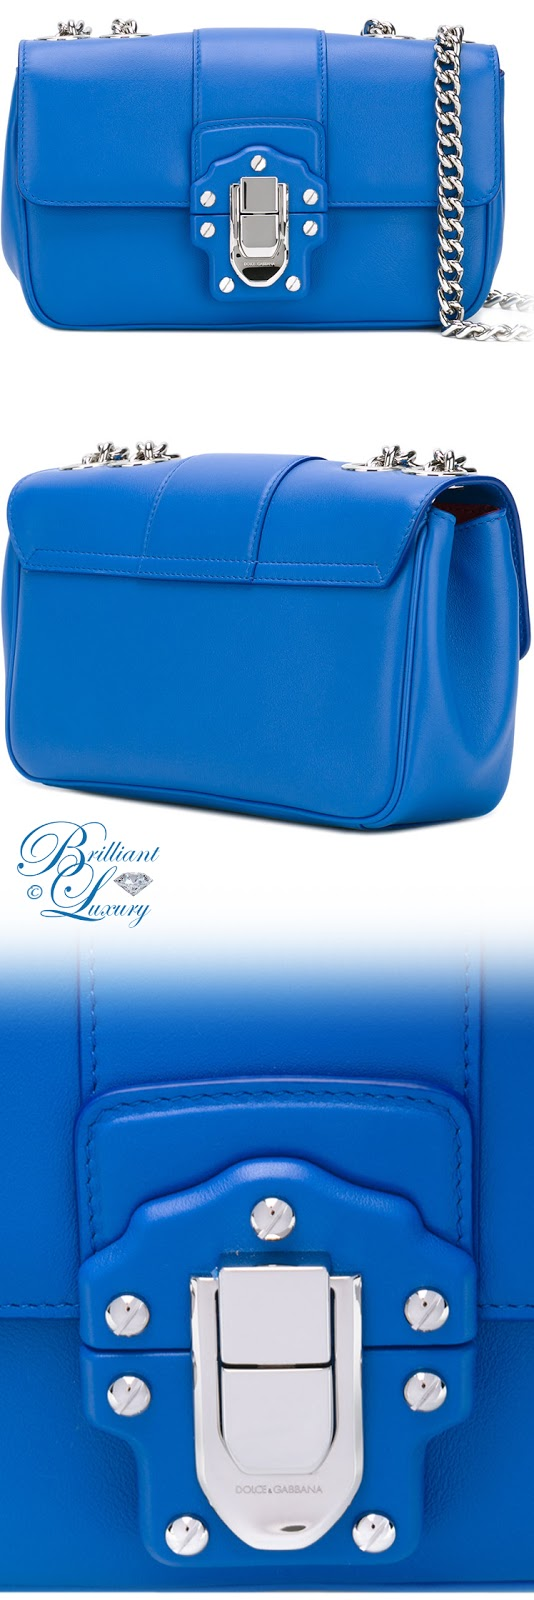 Brilliant Luxury ♦ Dolce & Gabbana Lucia Shoulder Bag